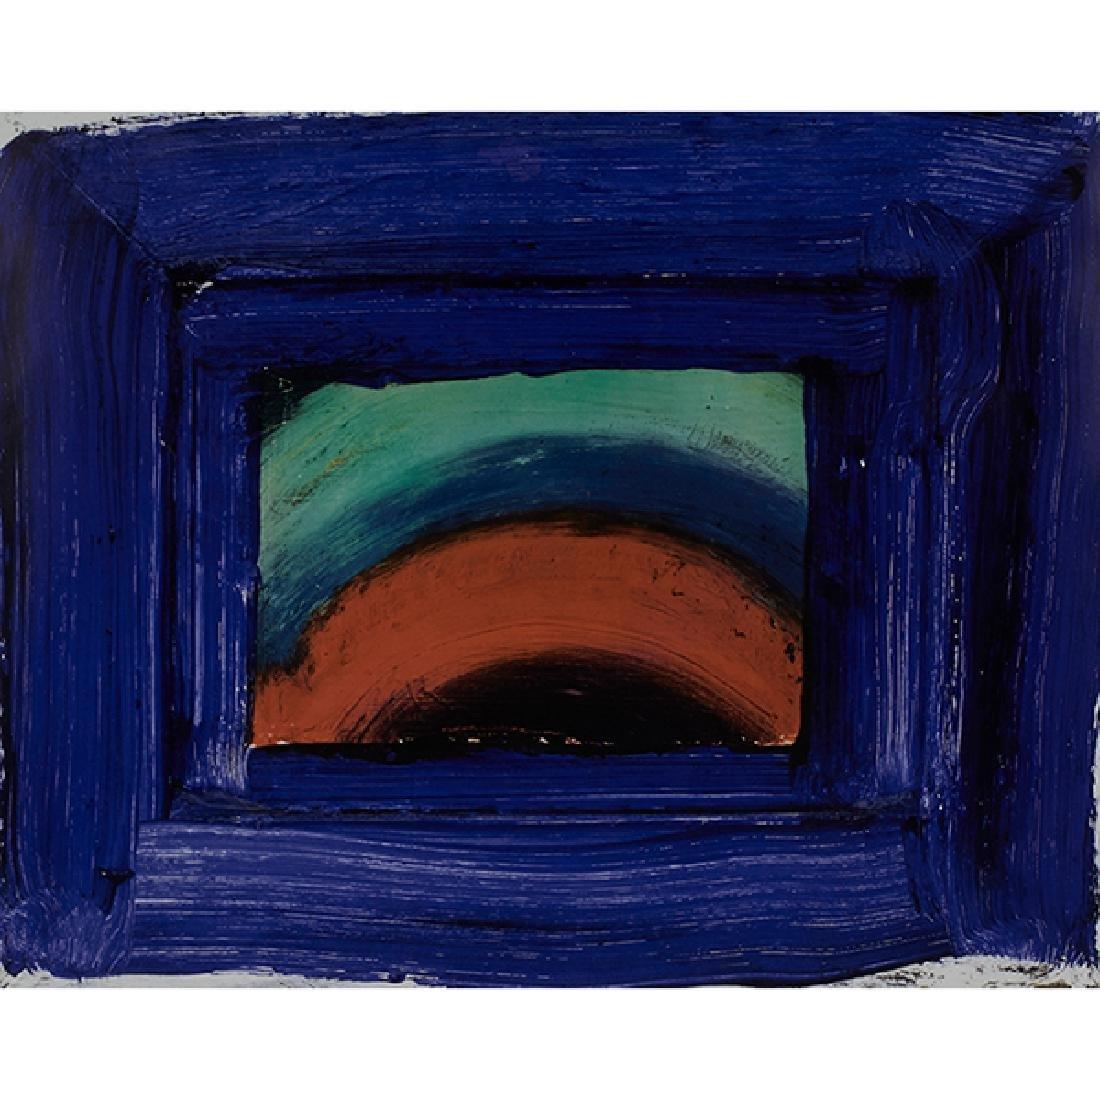 Howard Hodgkin, (British, 1932-2017), Venetian Glass,